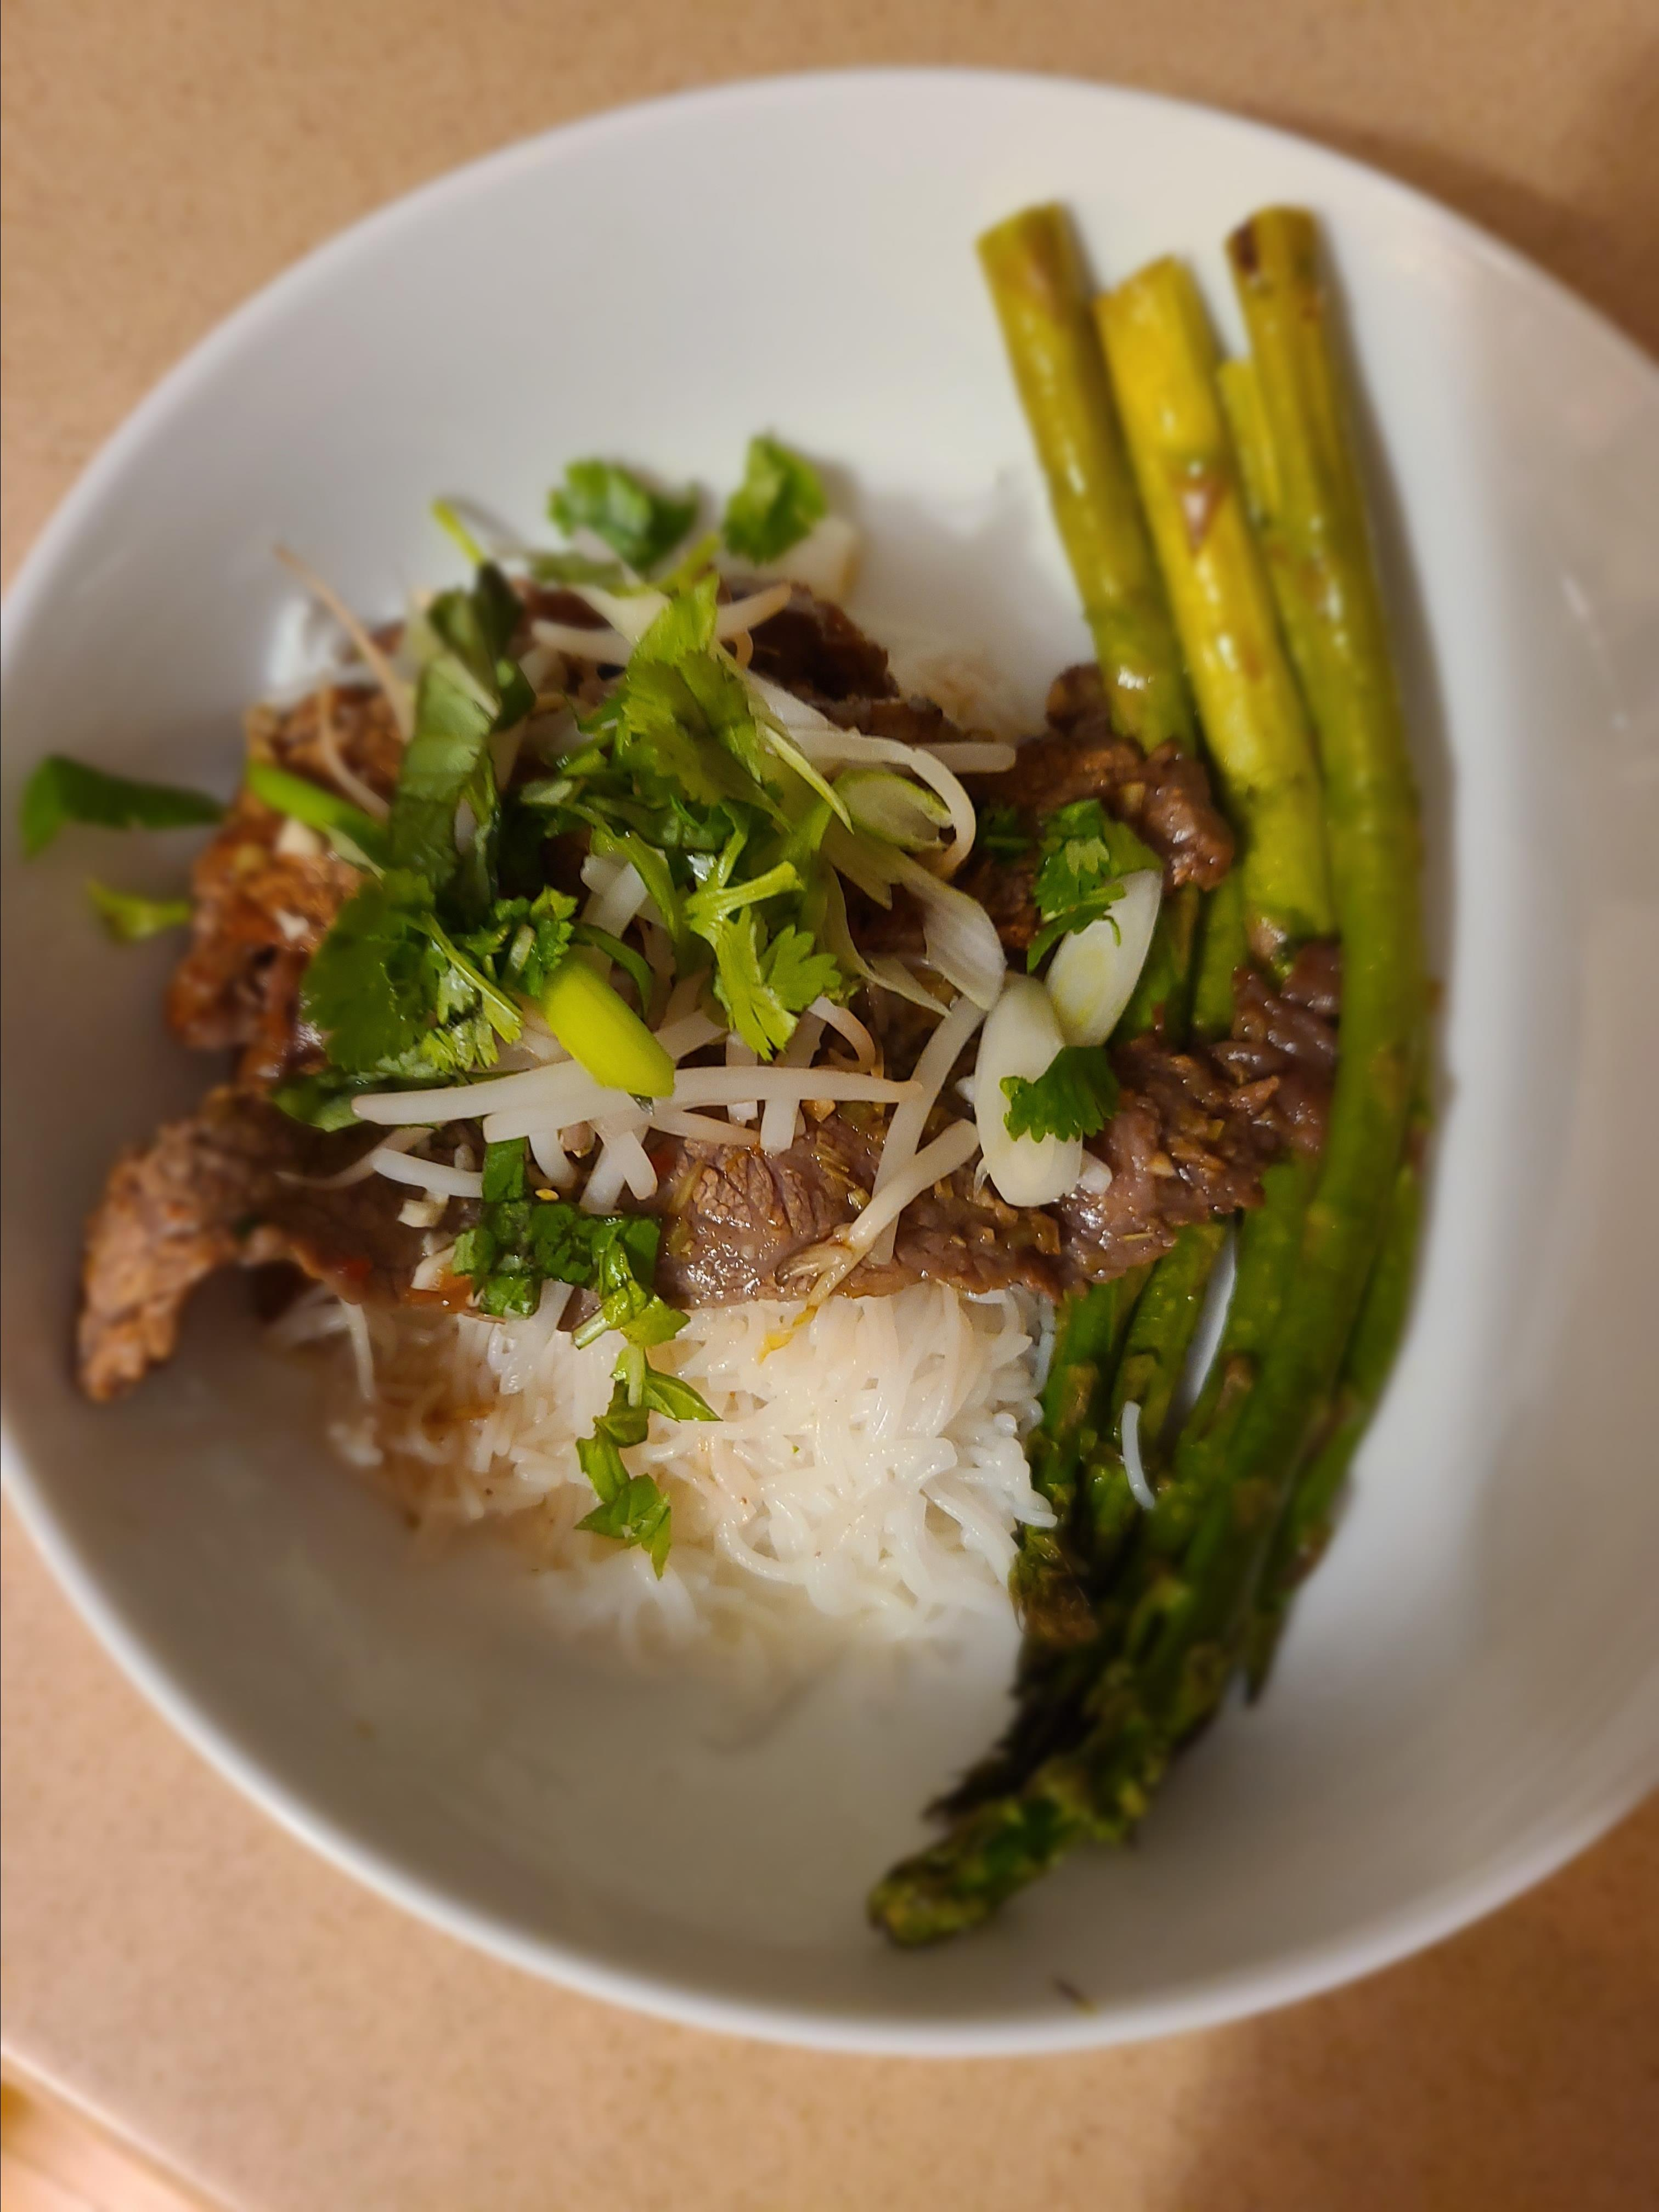 Vietnamese Lemongrass Beef and Noodles Awilda